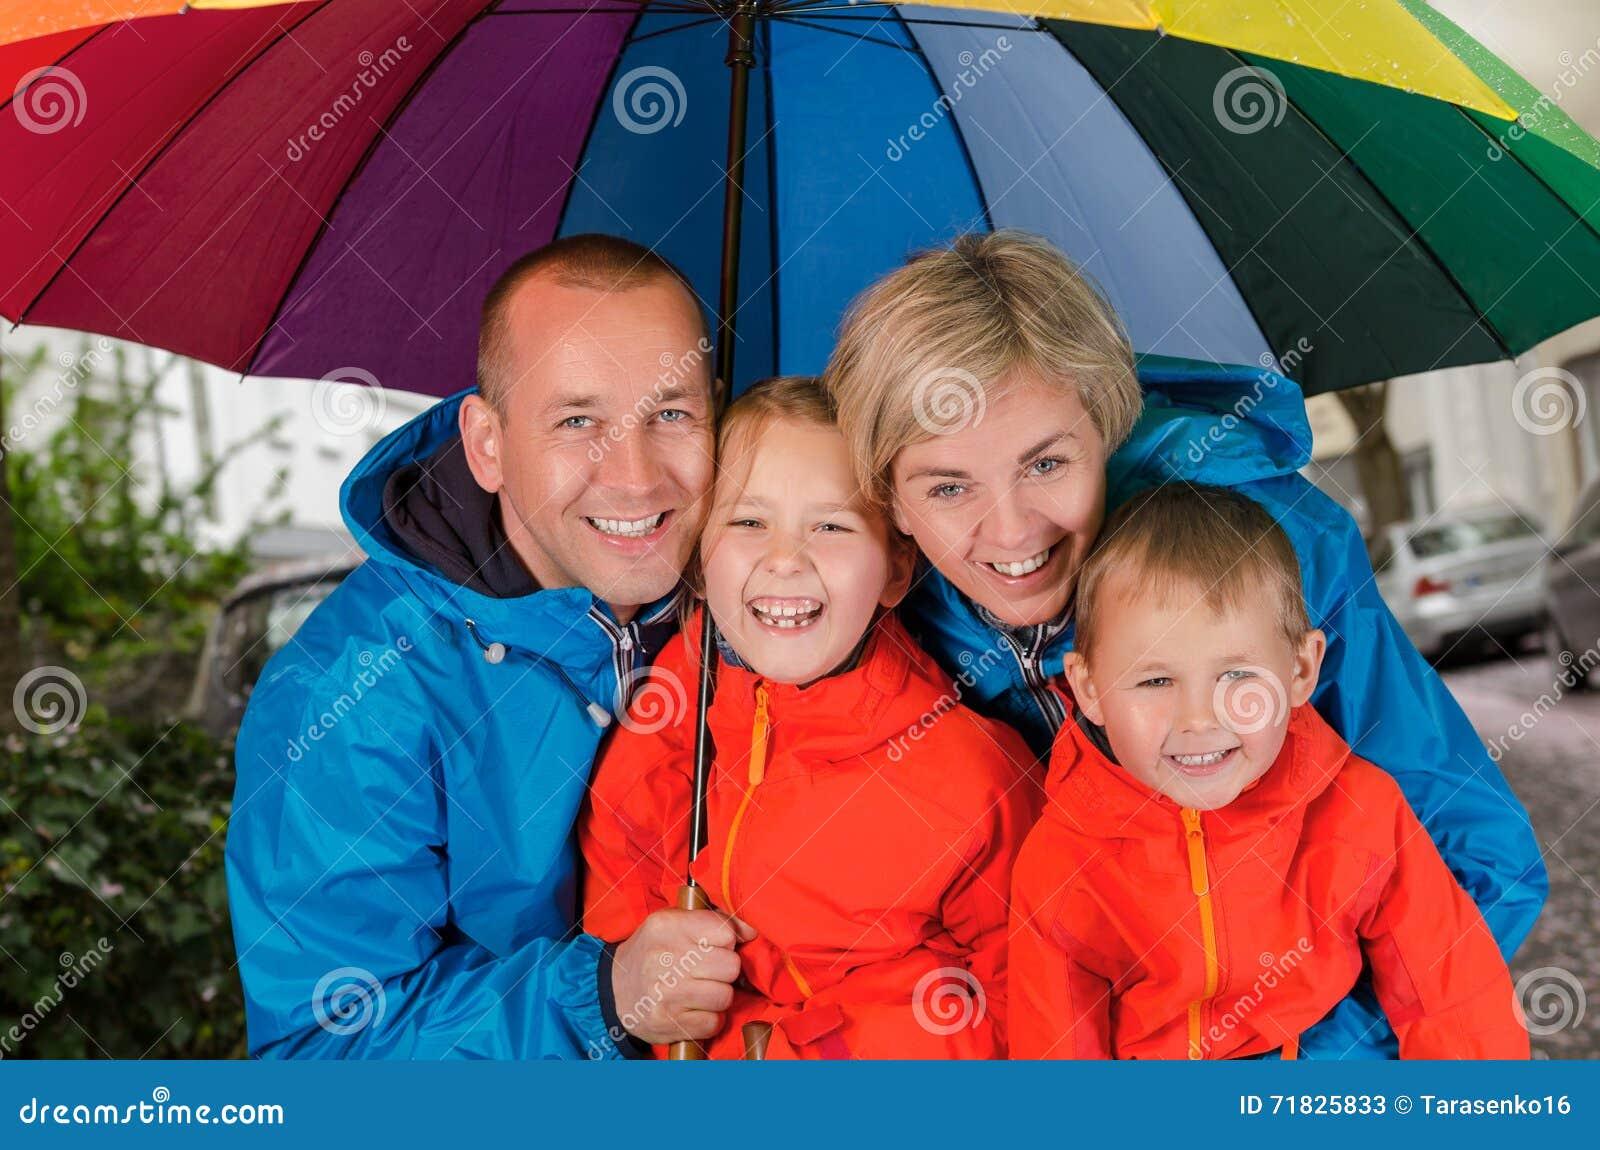 34400a11e5d2 Happy Rain Family Under Umbrella Stock Image - Image of under ...